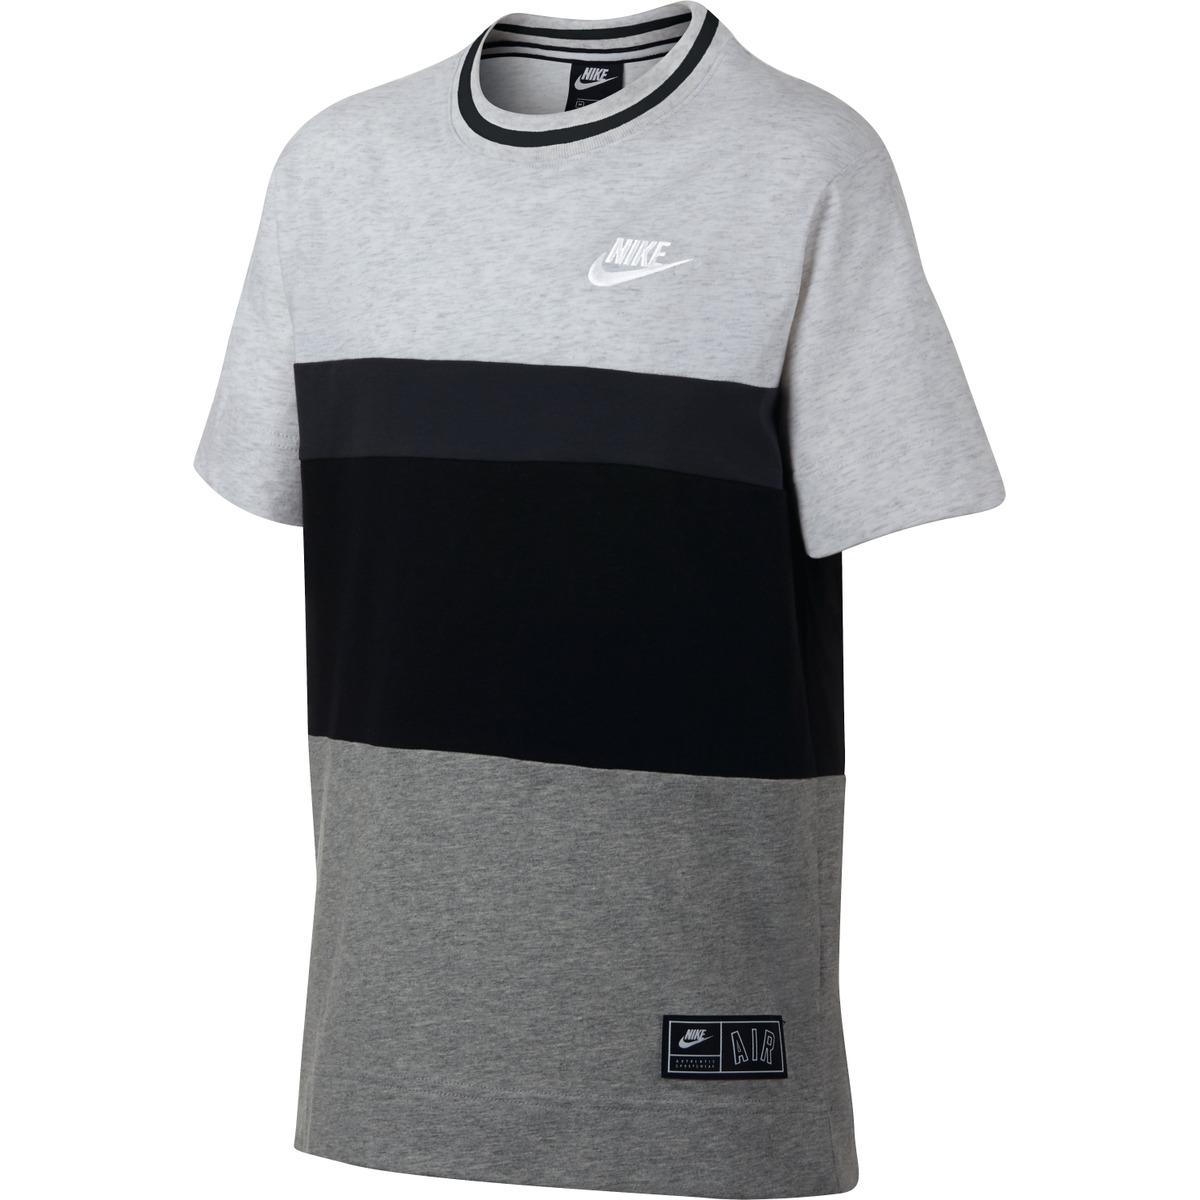 056f35eb Nike Air Boys' Short-Sleeve Top | SportsDeal